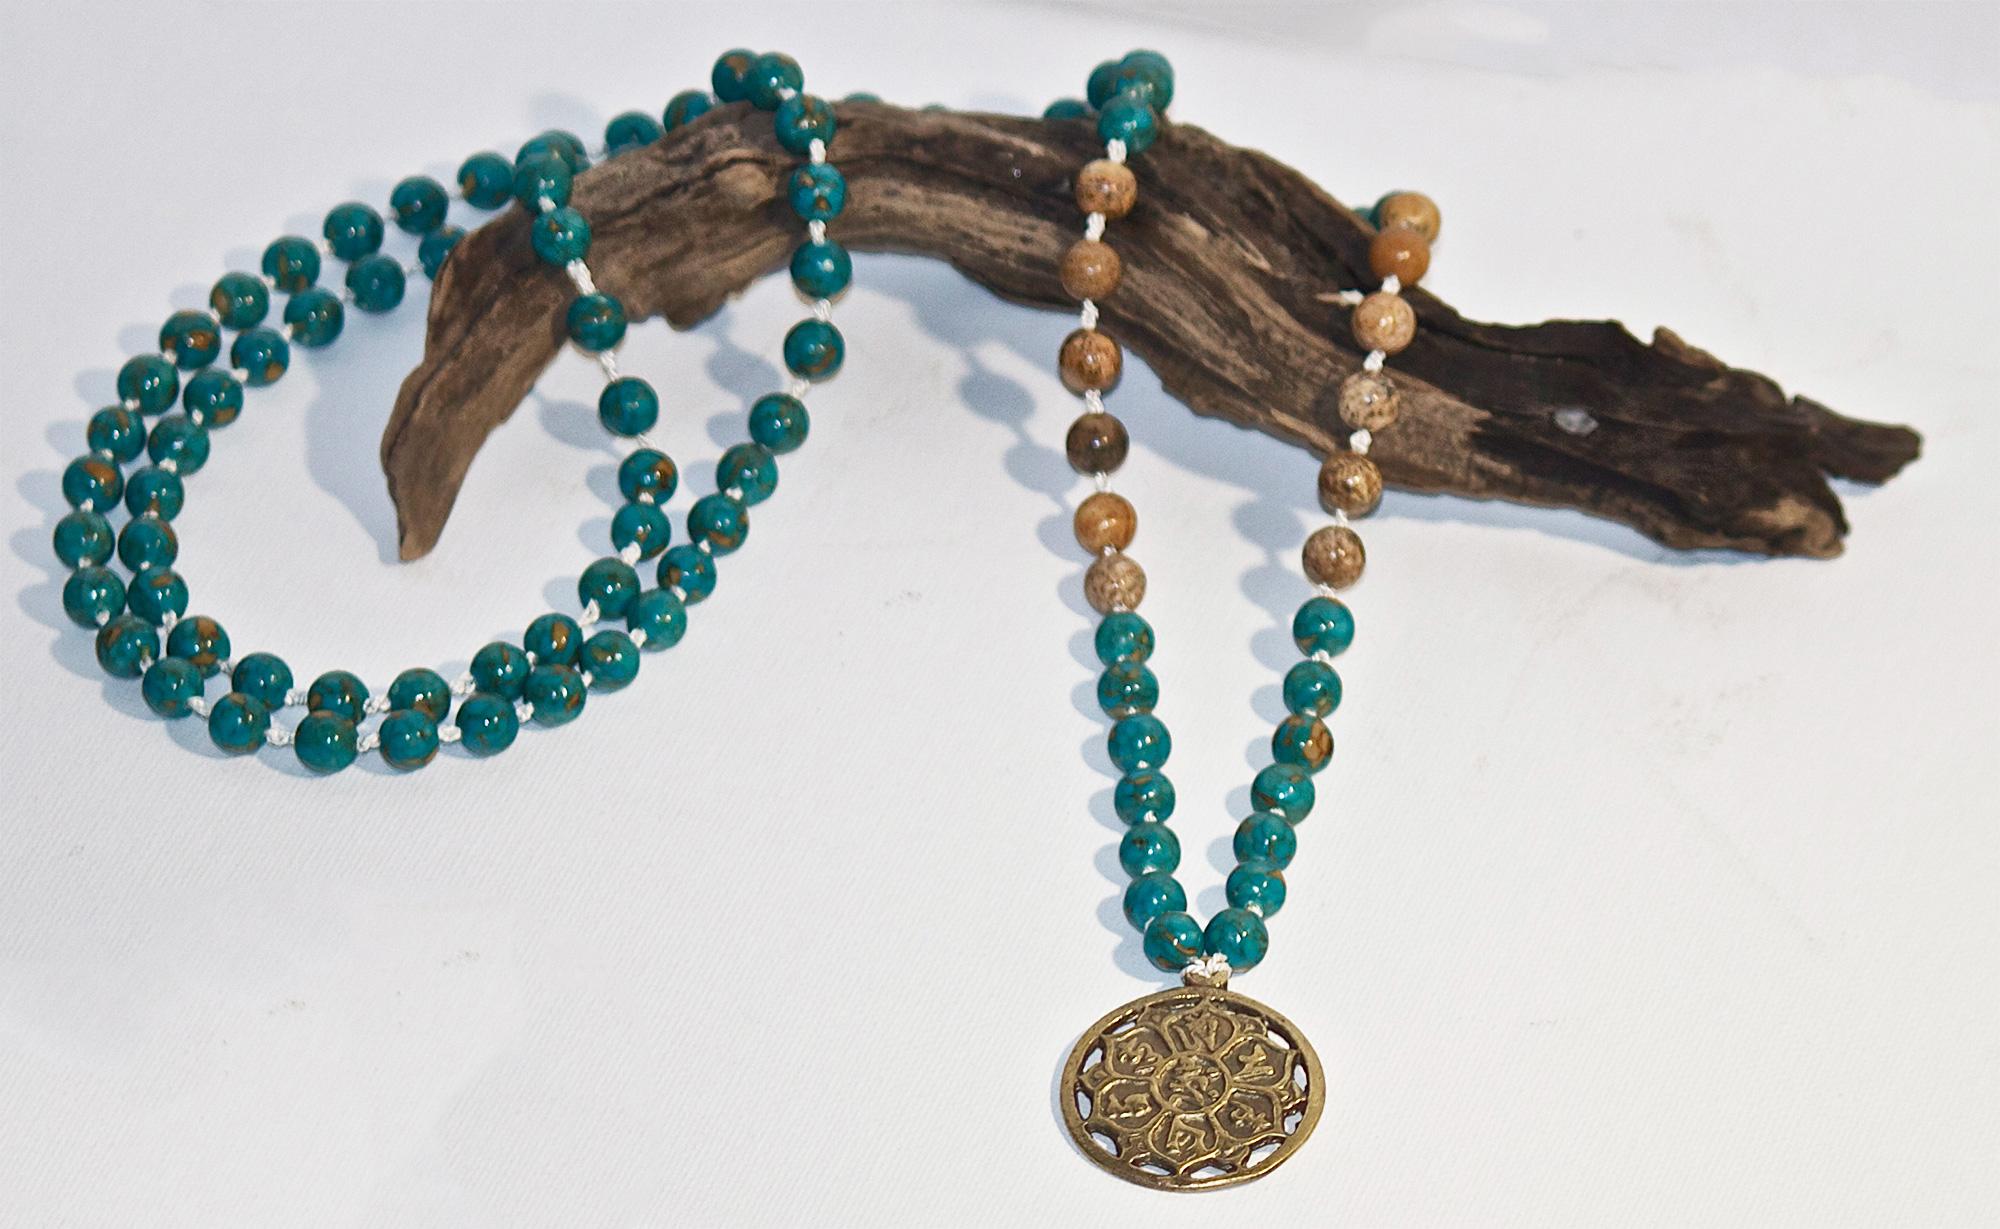 mosaic-turquoise-mala-2.jpg